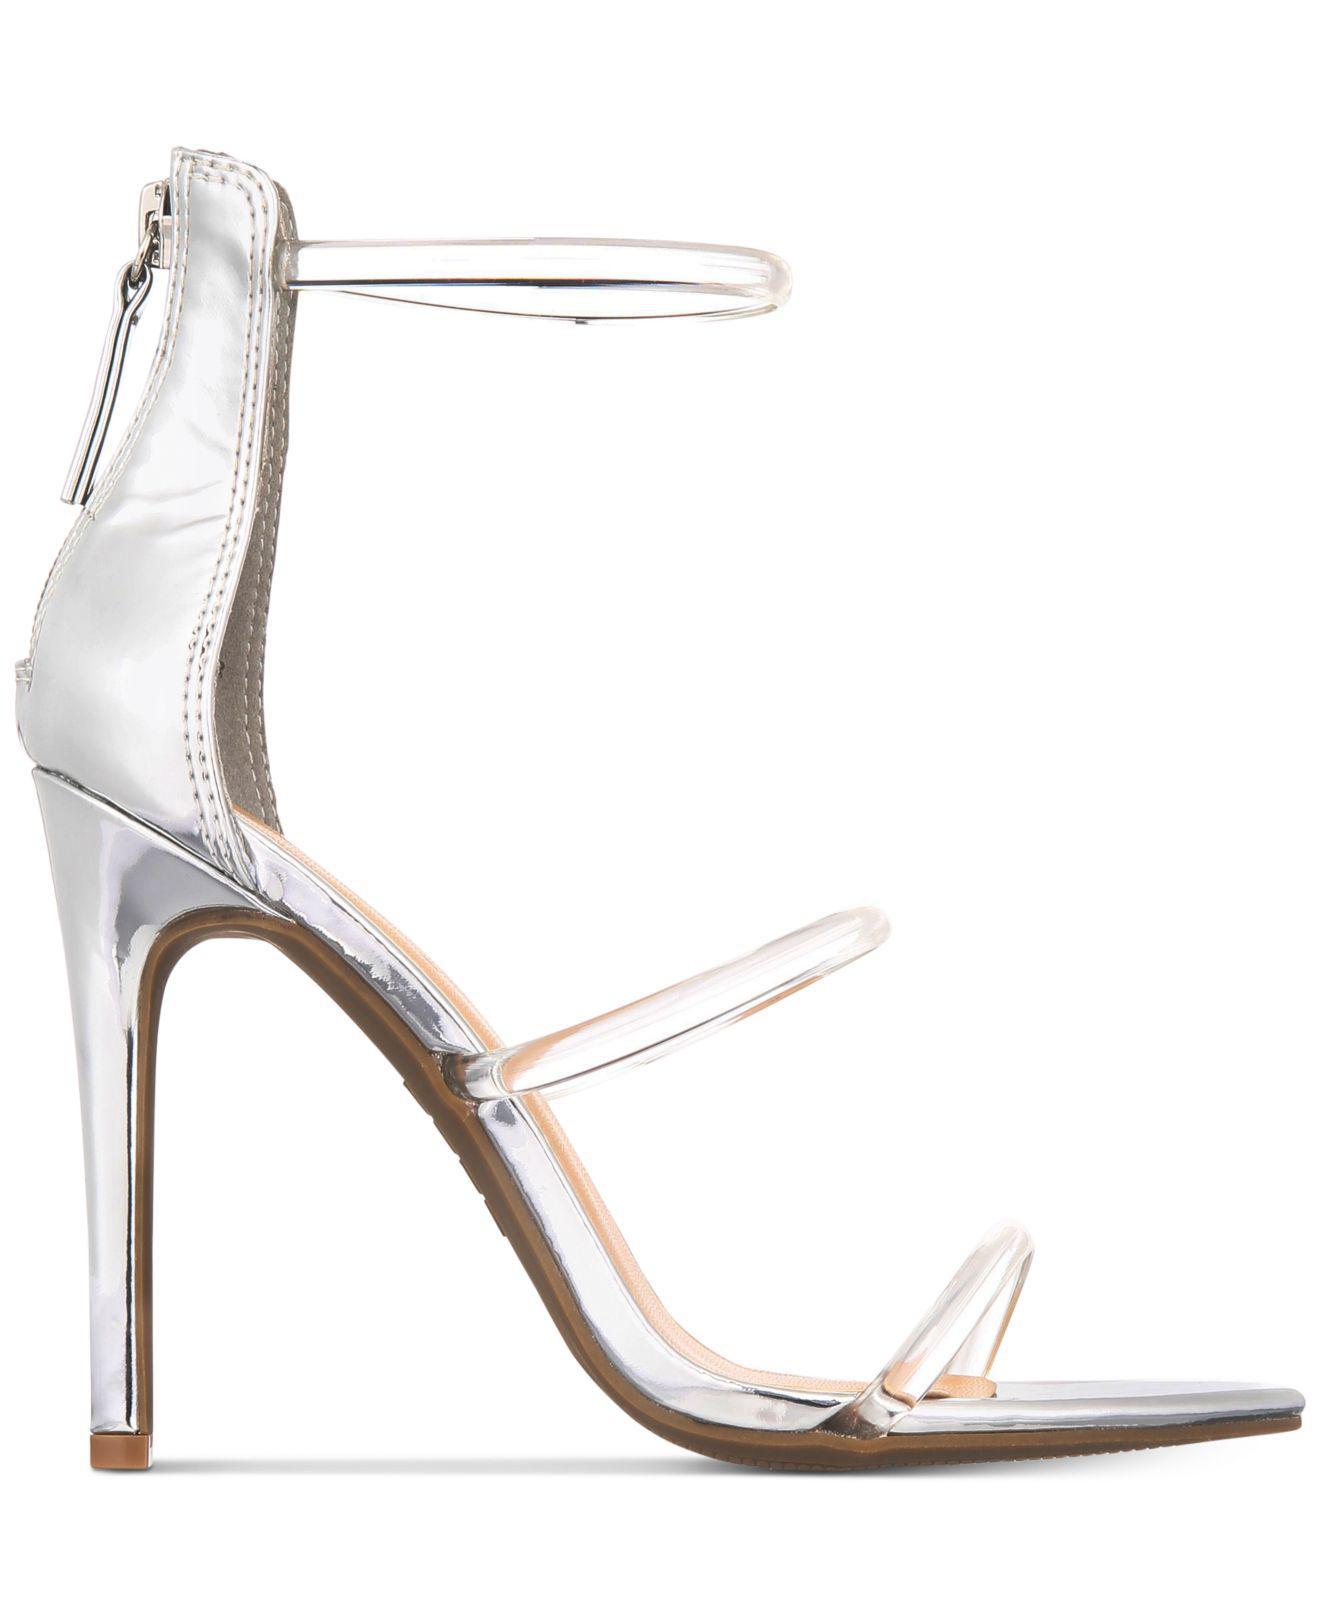 59325a0cfcf Bebe Womens Berdine Open Toe Casual Strappy Sandals